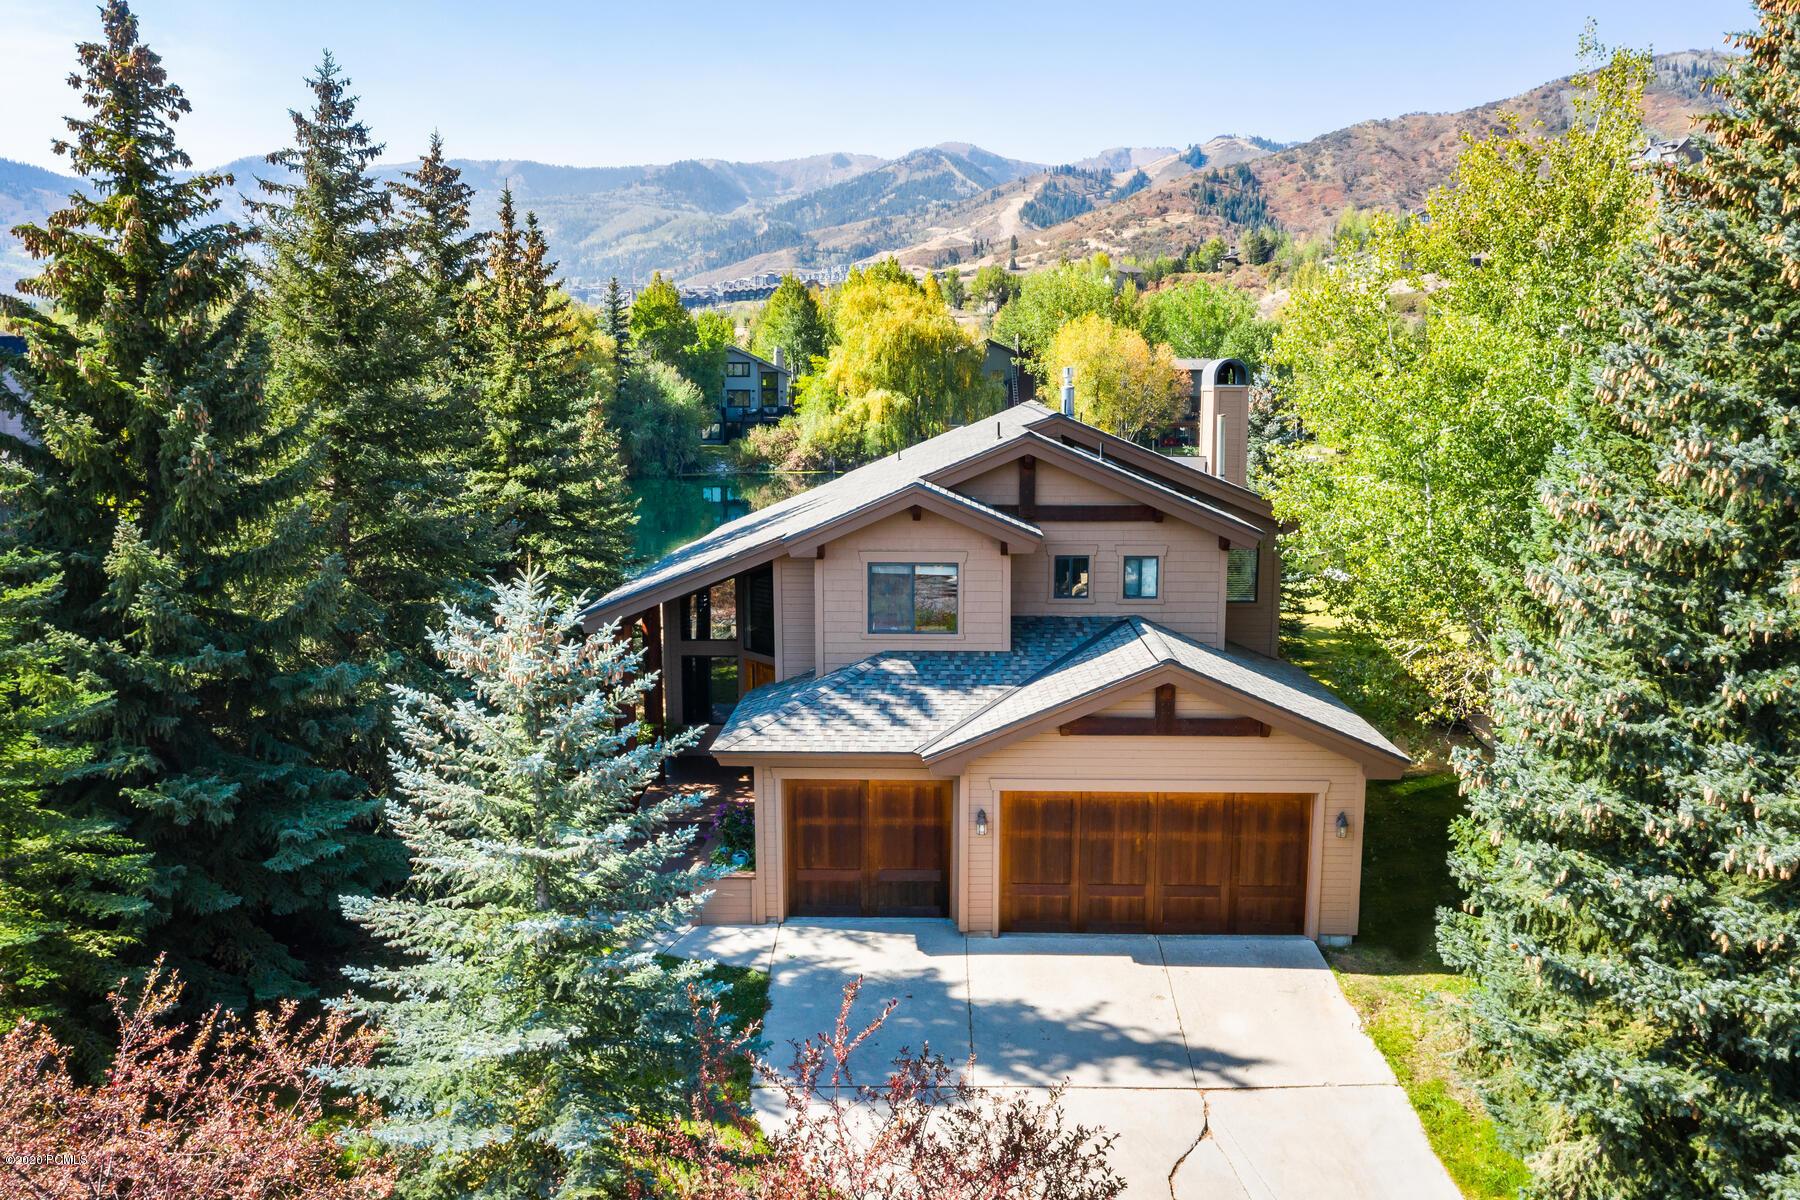 4871 Silver Springs Drive, Park City, Utah 84098, 4 Bedrooms Bedrooms, ,3 BathroomsBathrooms,Single Family,For Sale,Silver Springs,12003675